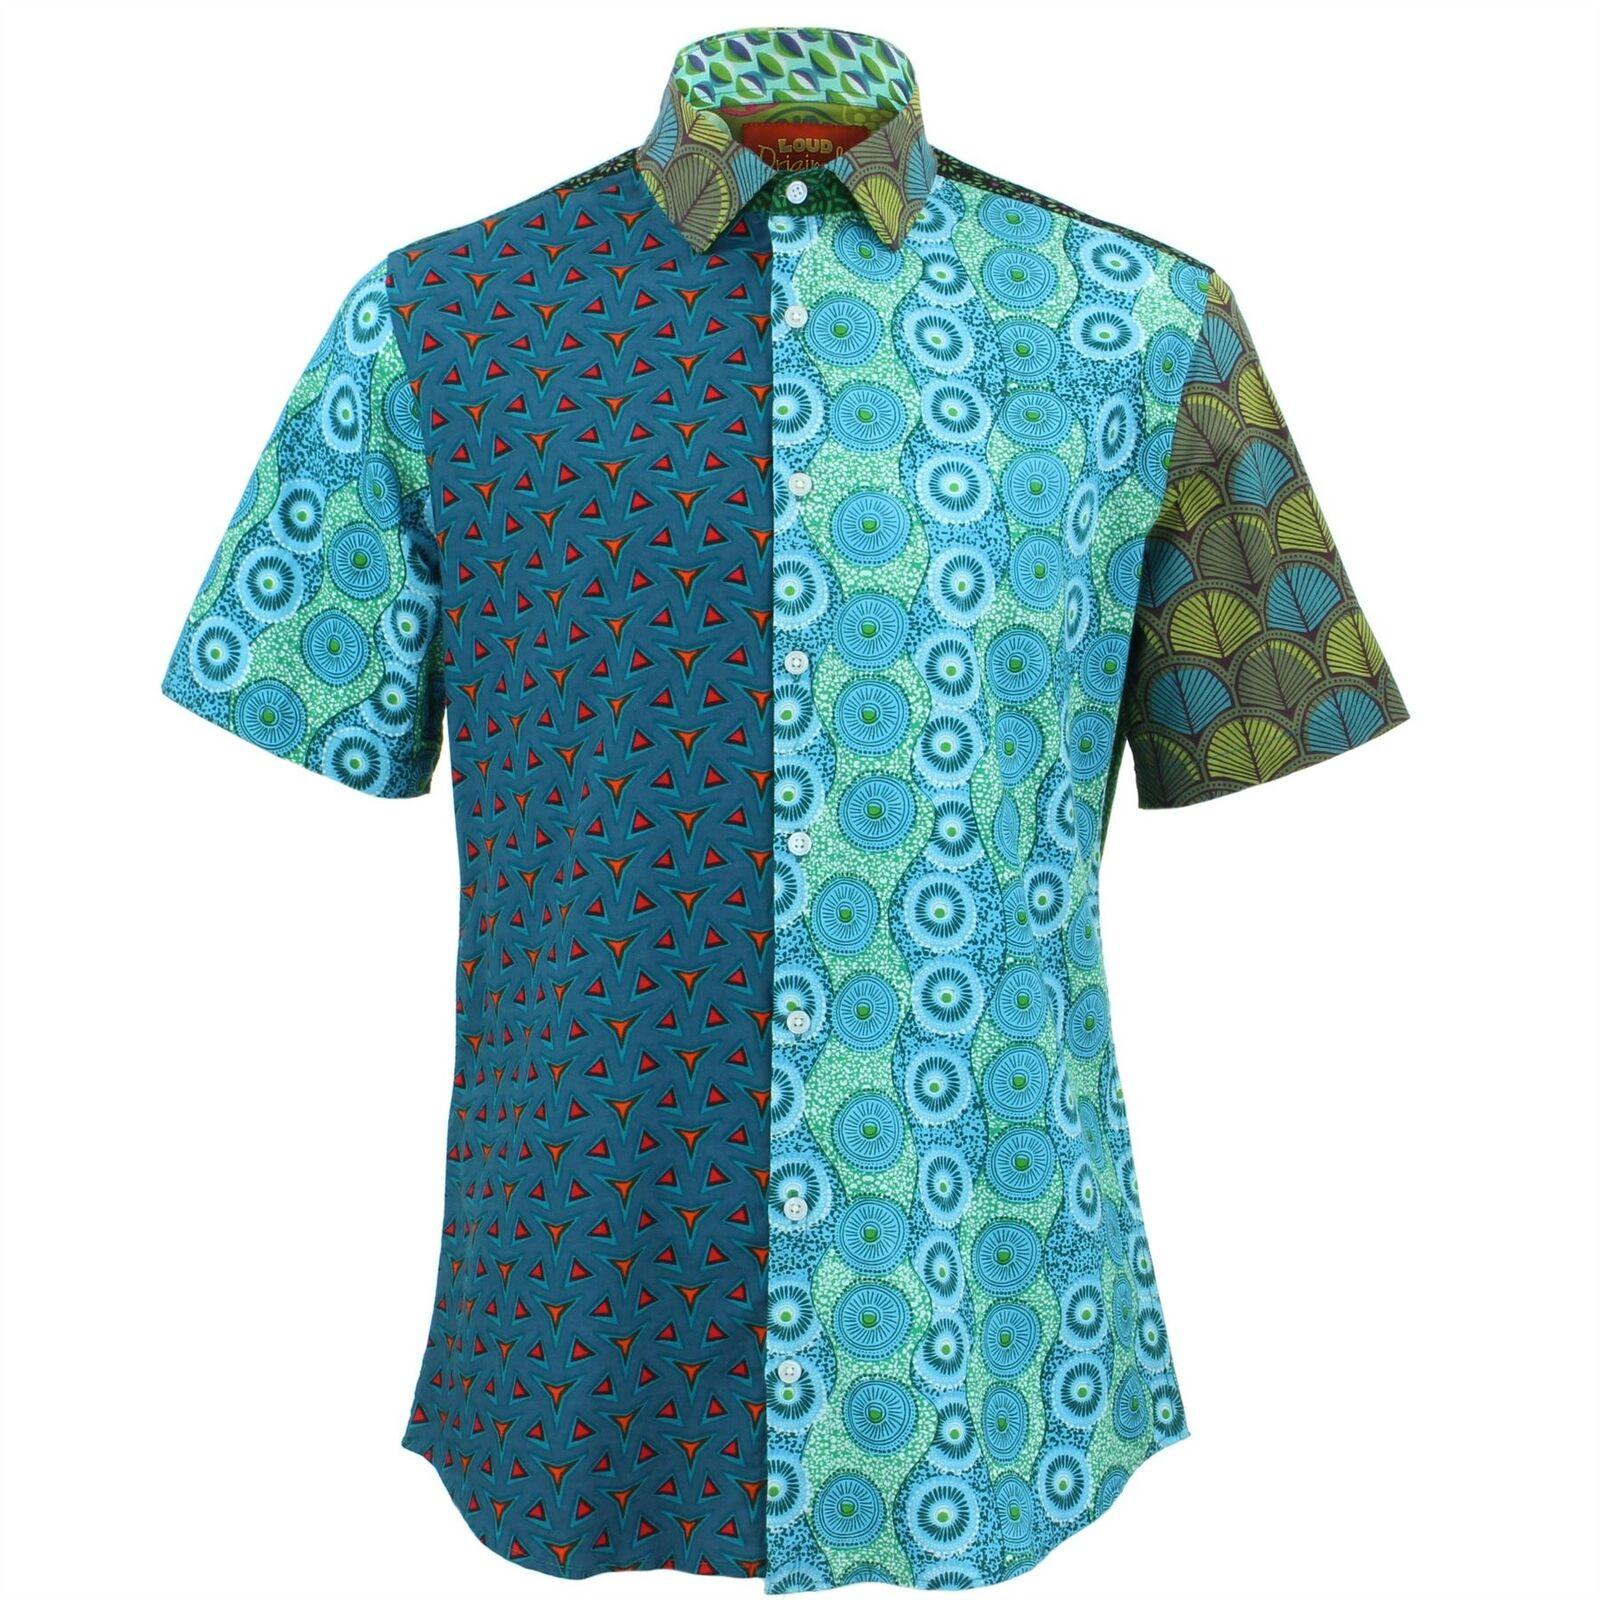 Mens Shirt Loud Originals TAILGoldt FIT Random Panel Retro Psychedelic Fancy  | Schön und charmant  | Verschiedene Waren  | Neues Produkt